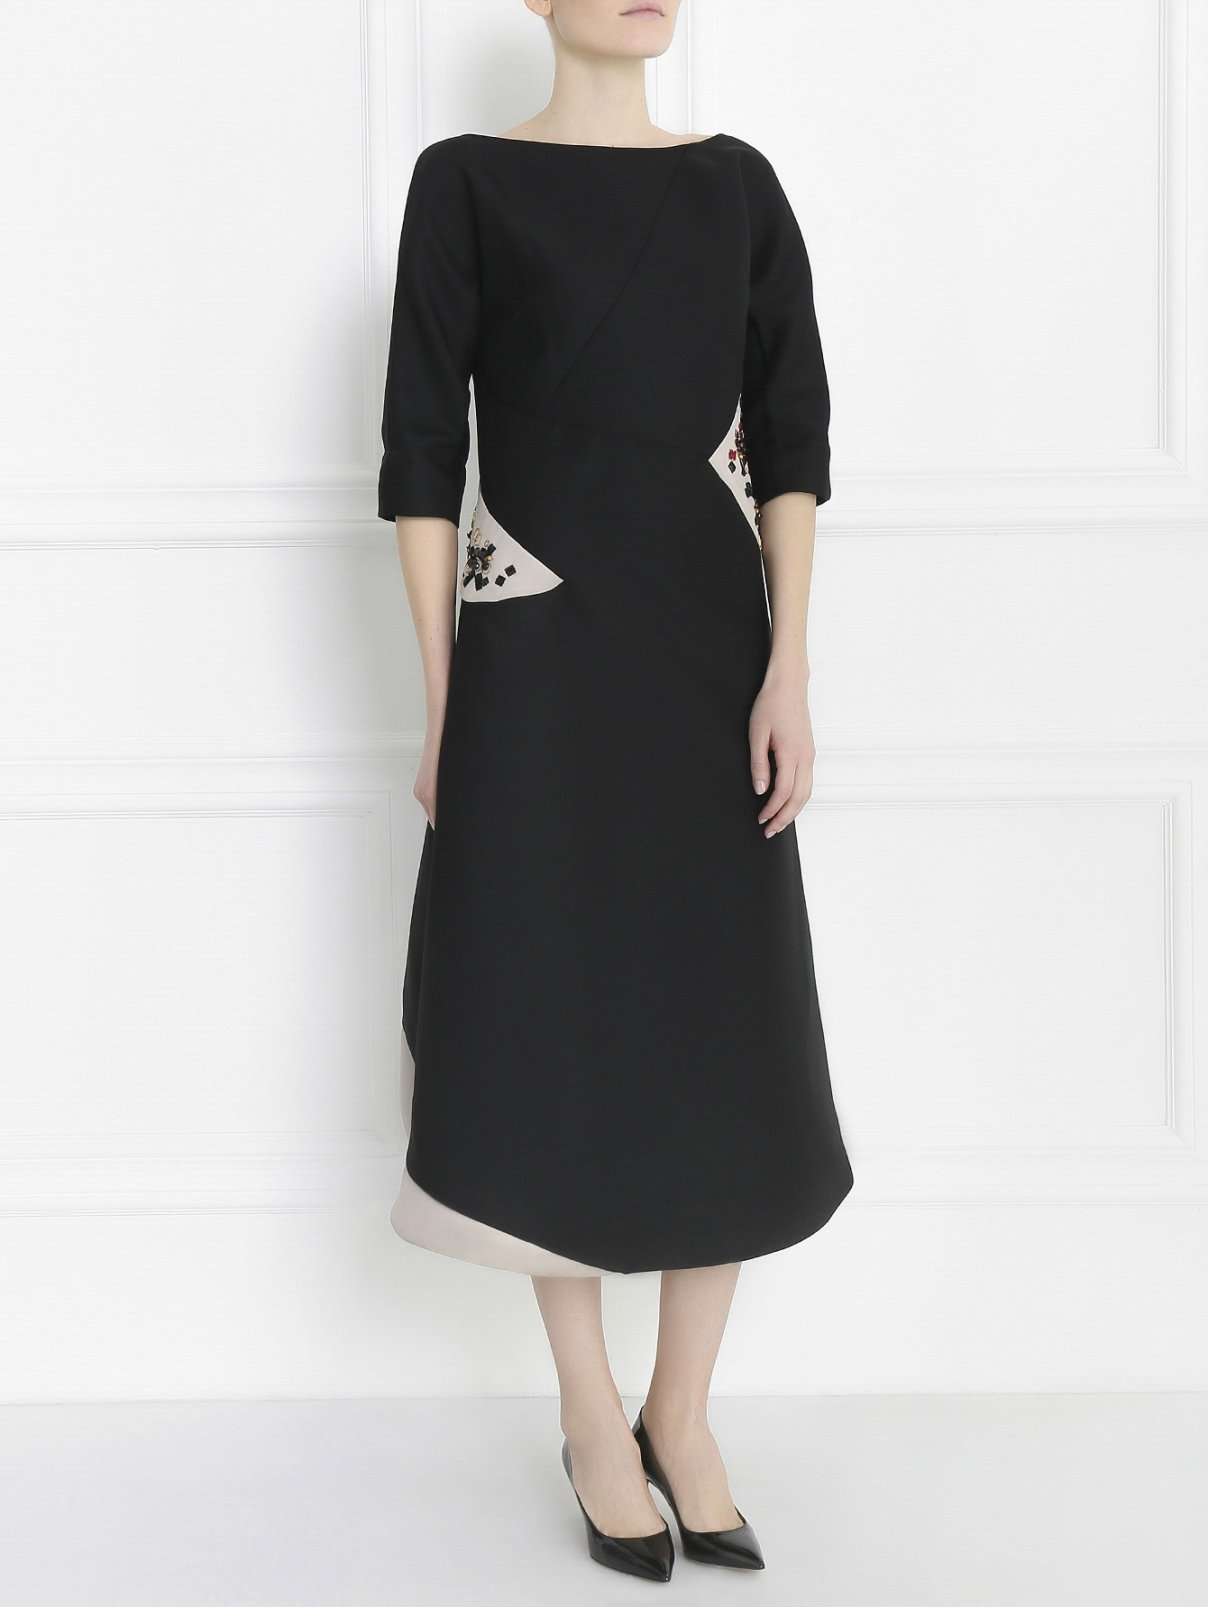 Платье-футляр декорированное кристаллами Jil Sander  –  Модель Общий вид